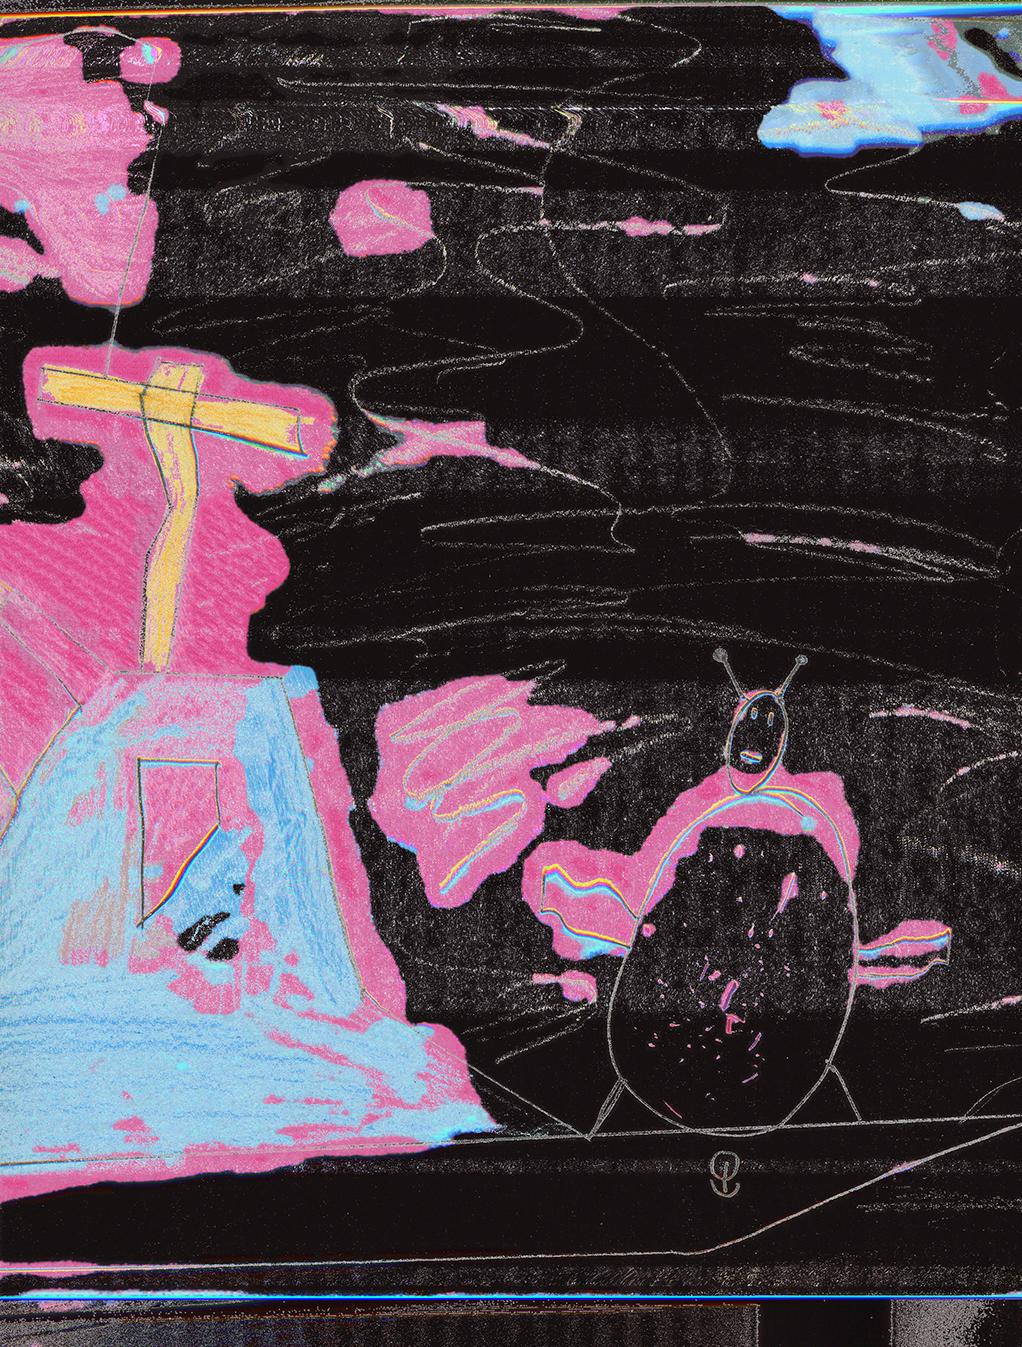 TYT_03, 2018 Inkjet on canvas 90 x 67 cm Edition of 50 480 EUR